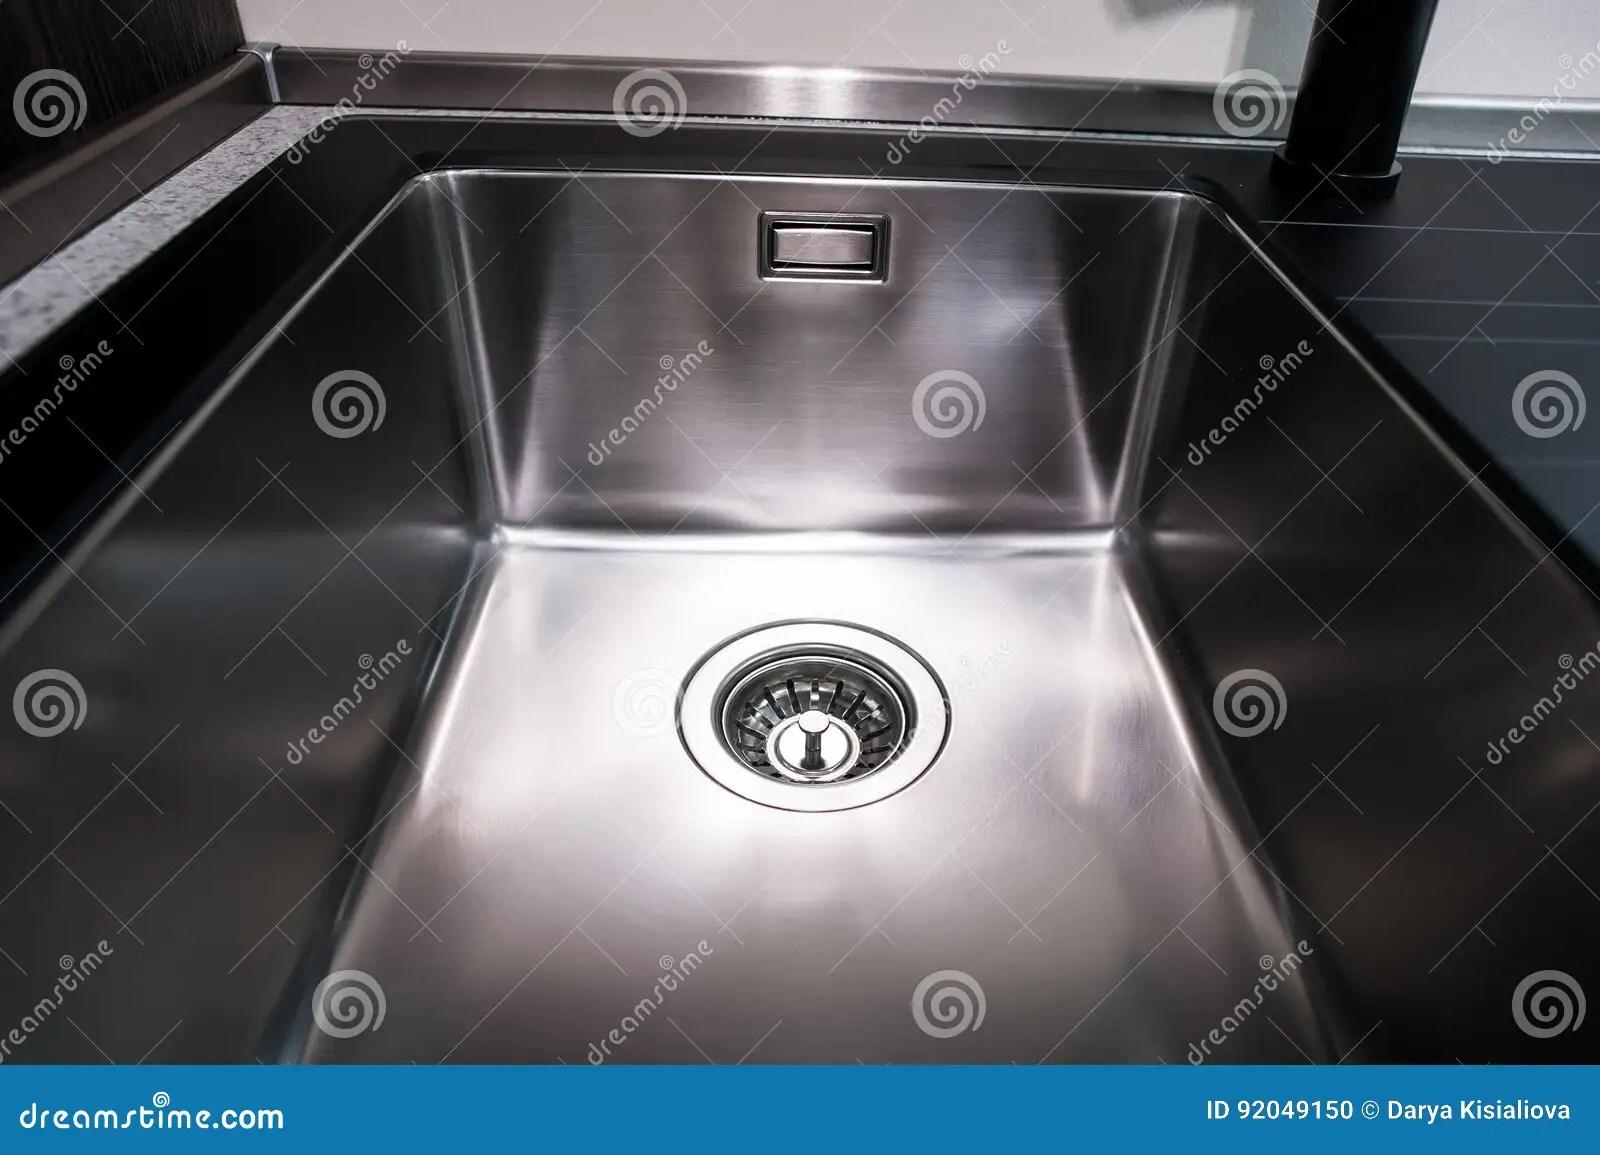 gold kitchen faucet apron front sink 厨房水槽角度图与金龙头的库存照片 图片包括有照亮 厨房 金属 管道 厨房水槽角度图与金龙头的